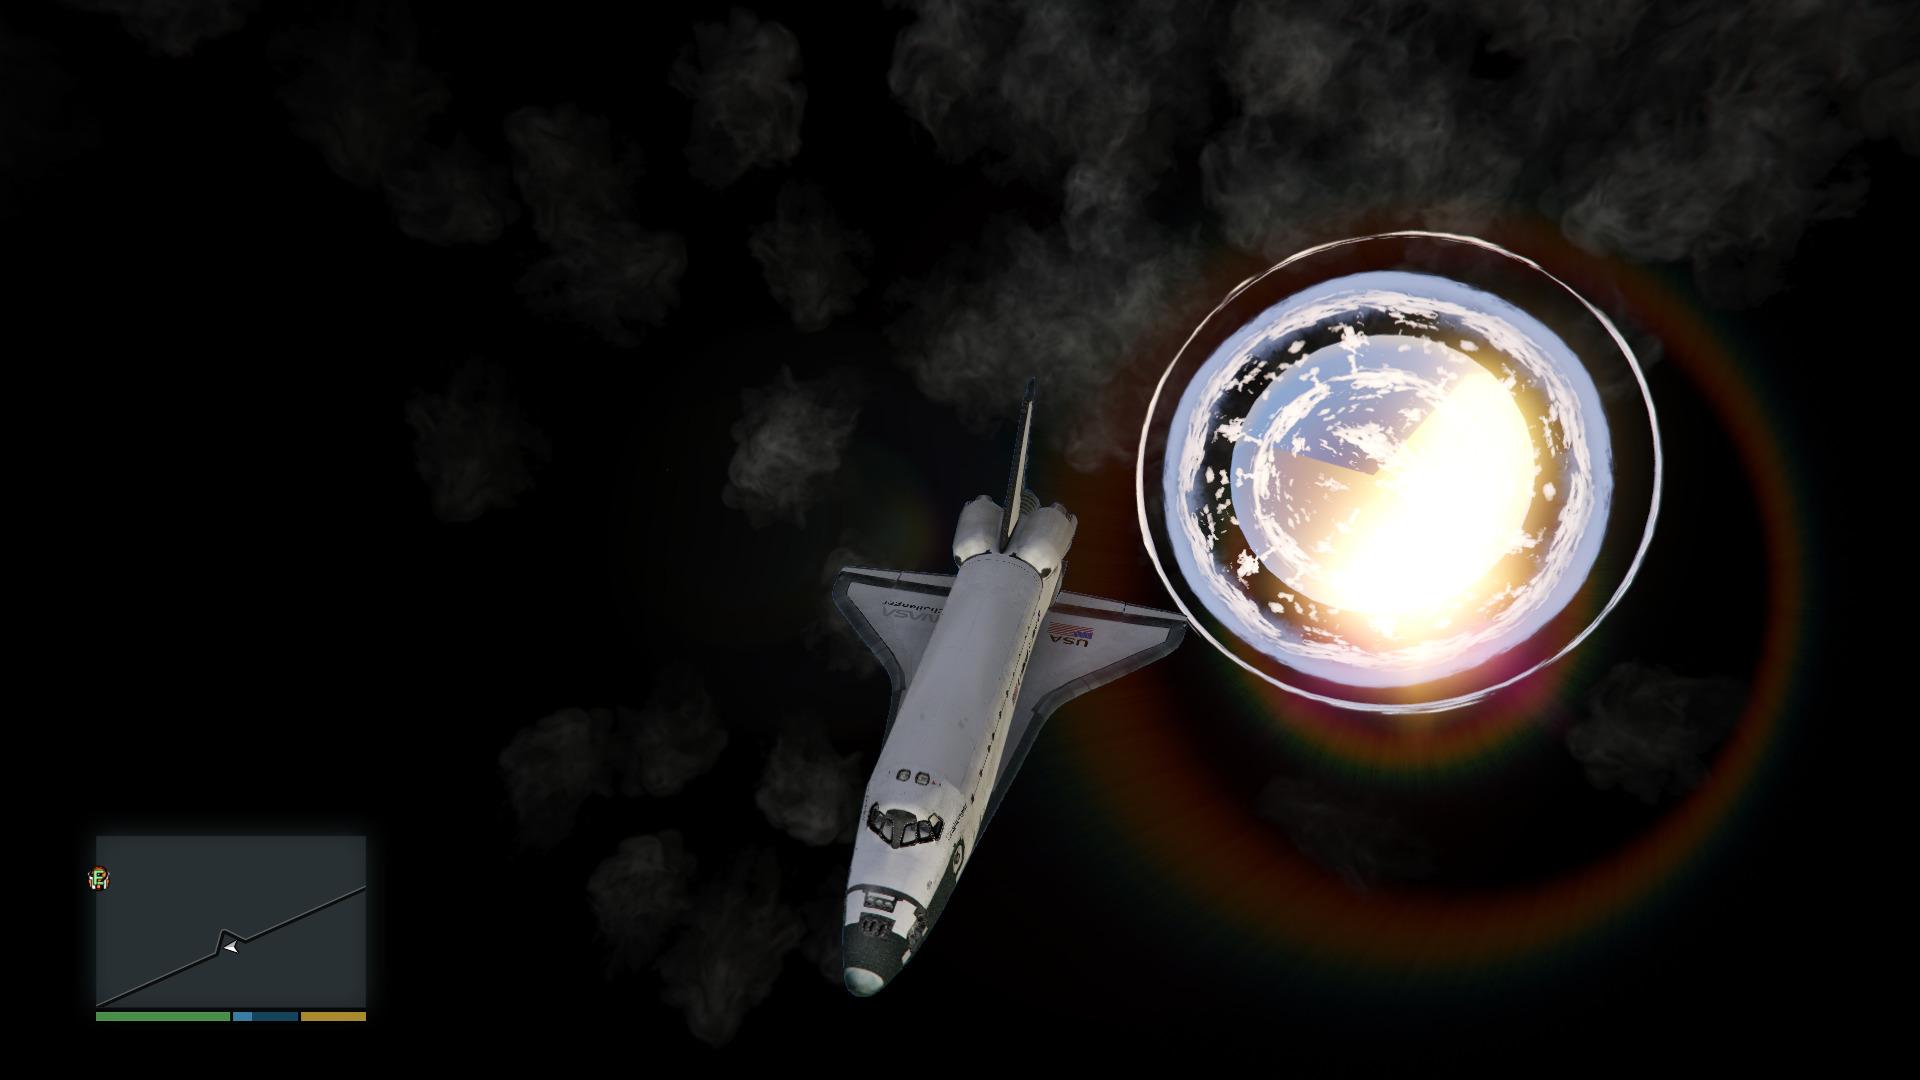 Мод NoBoundaryLimits для GTA 5 Space Mod v.1.1.1